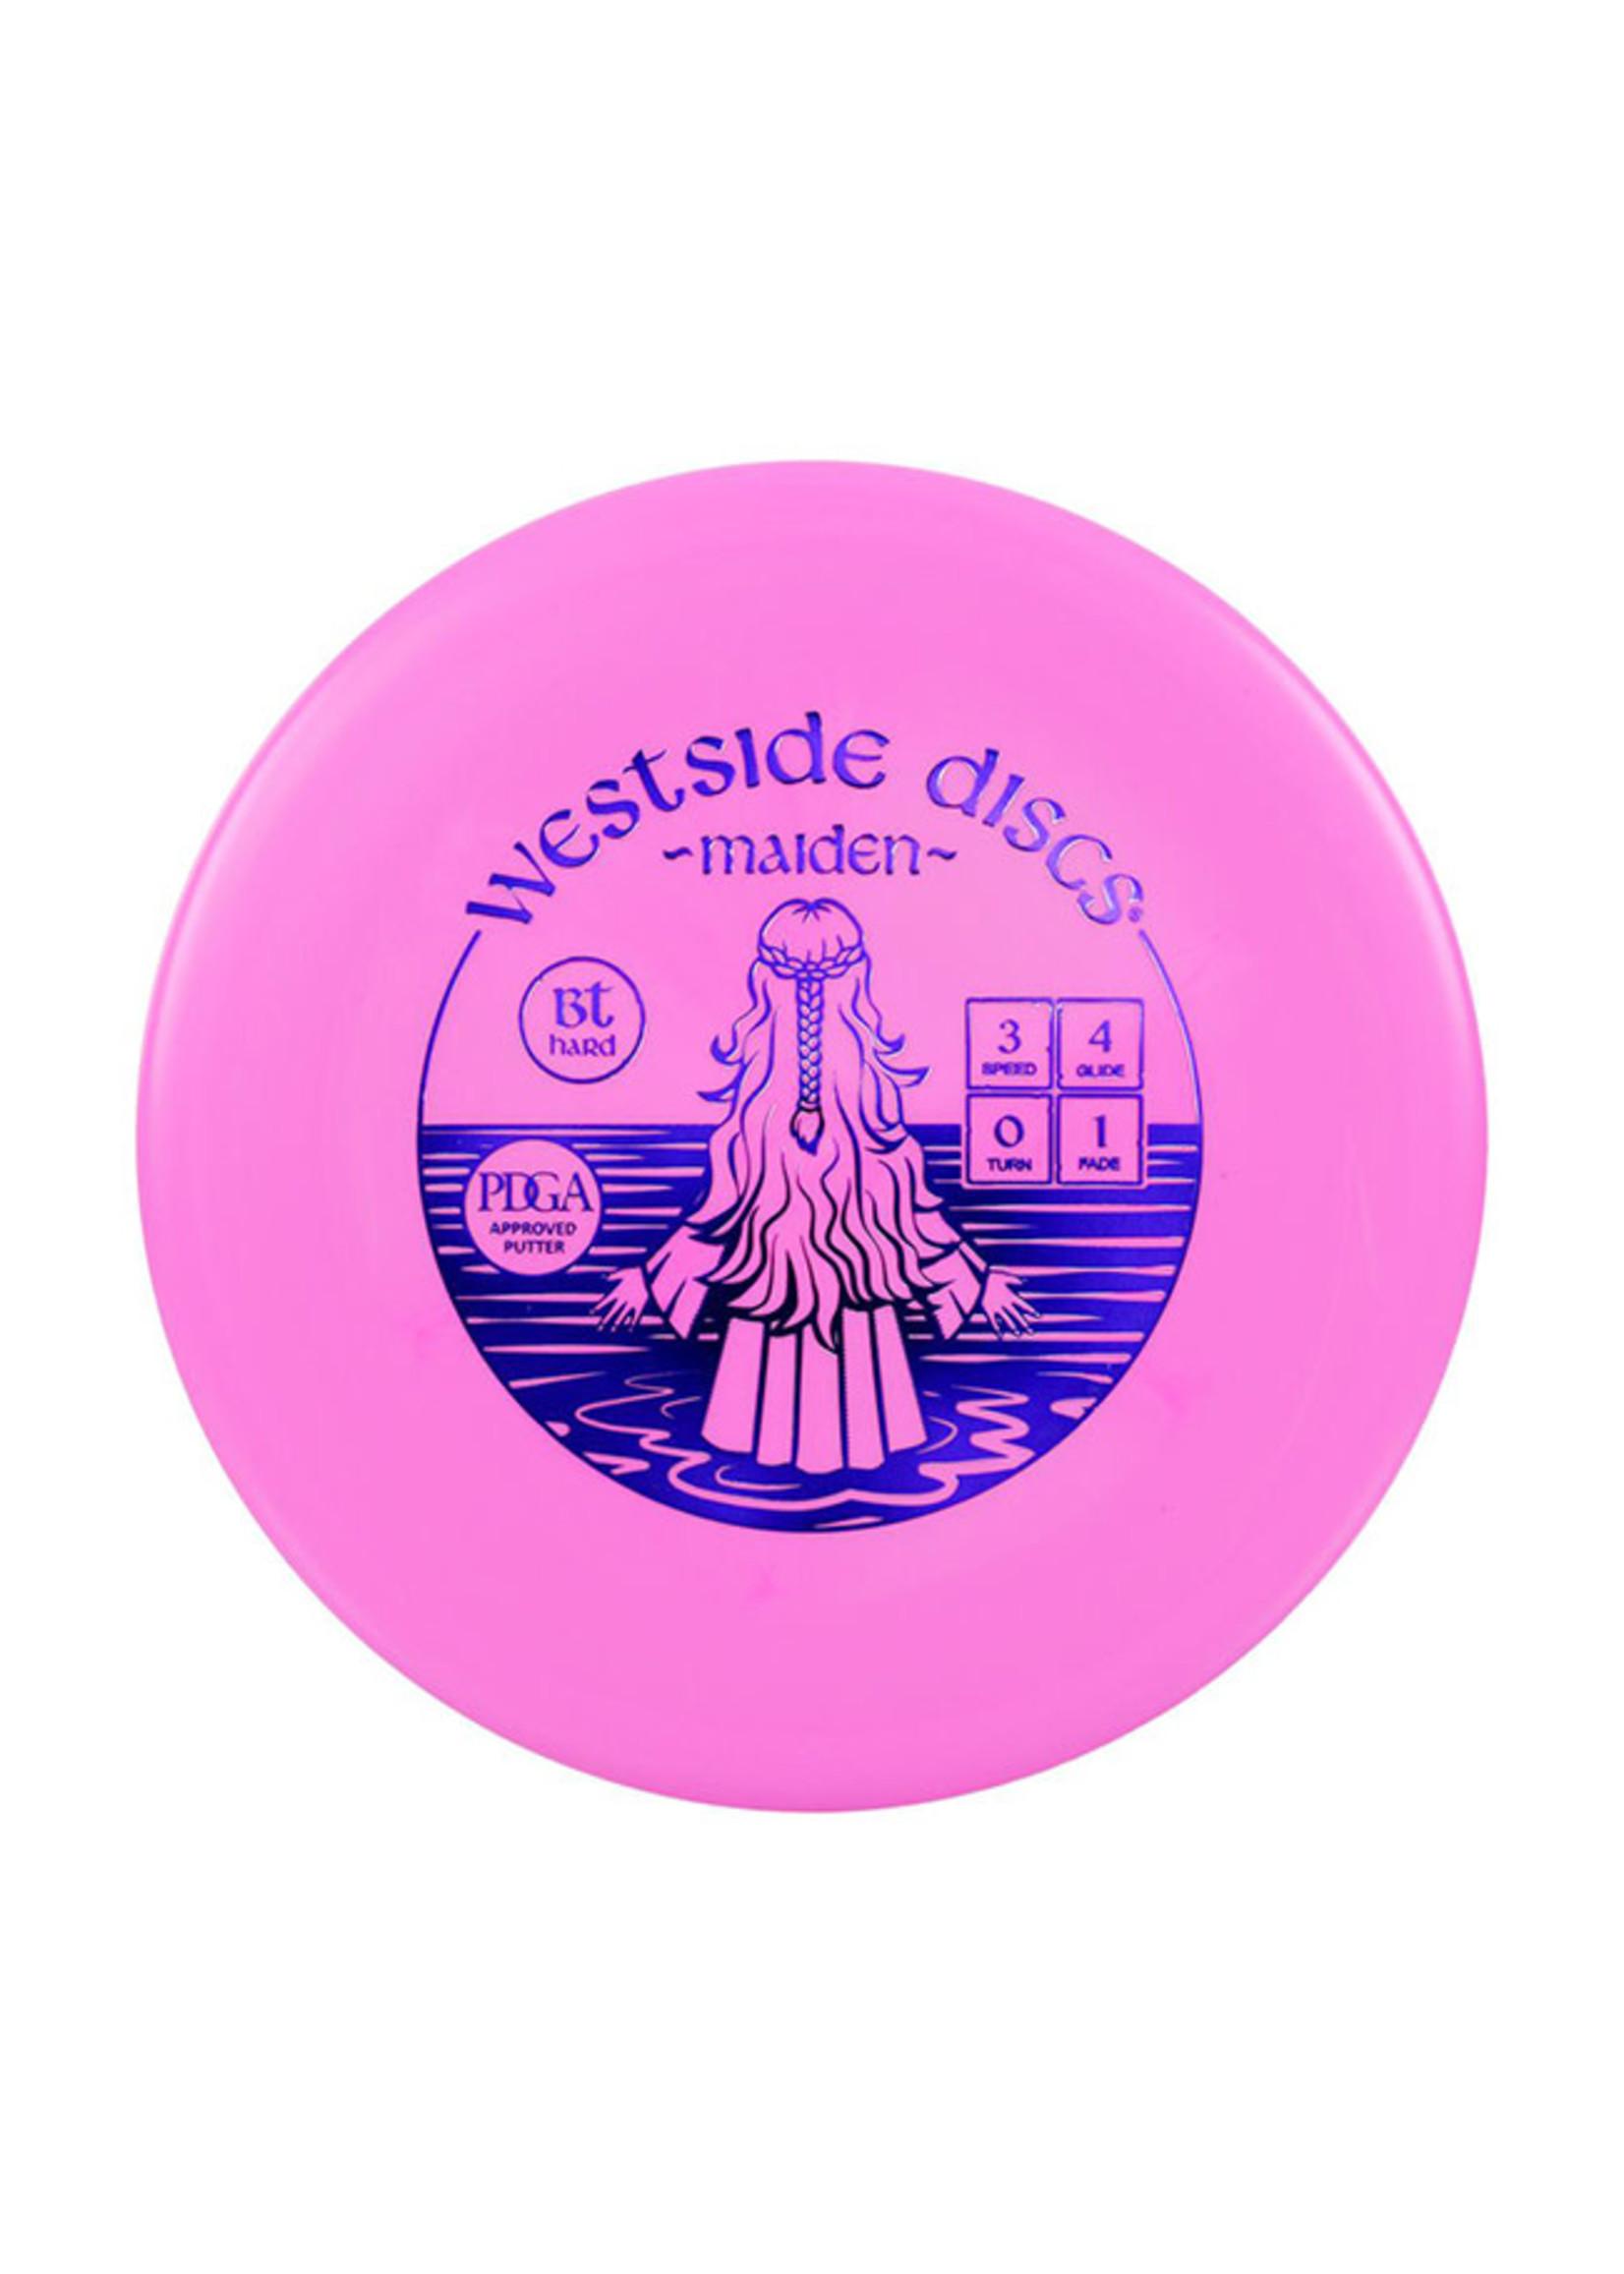 Westside Discs Westside Discs Maiden Putter